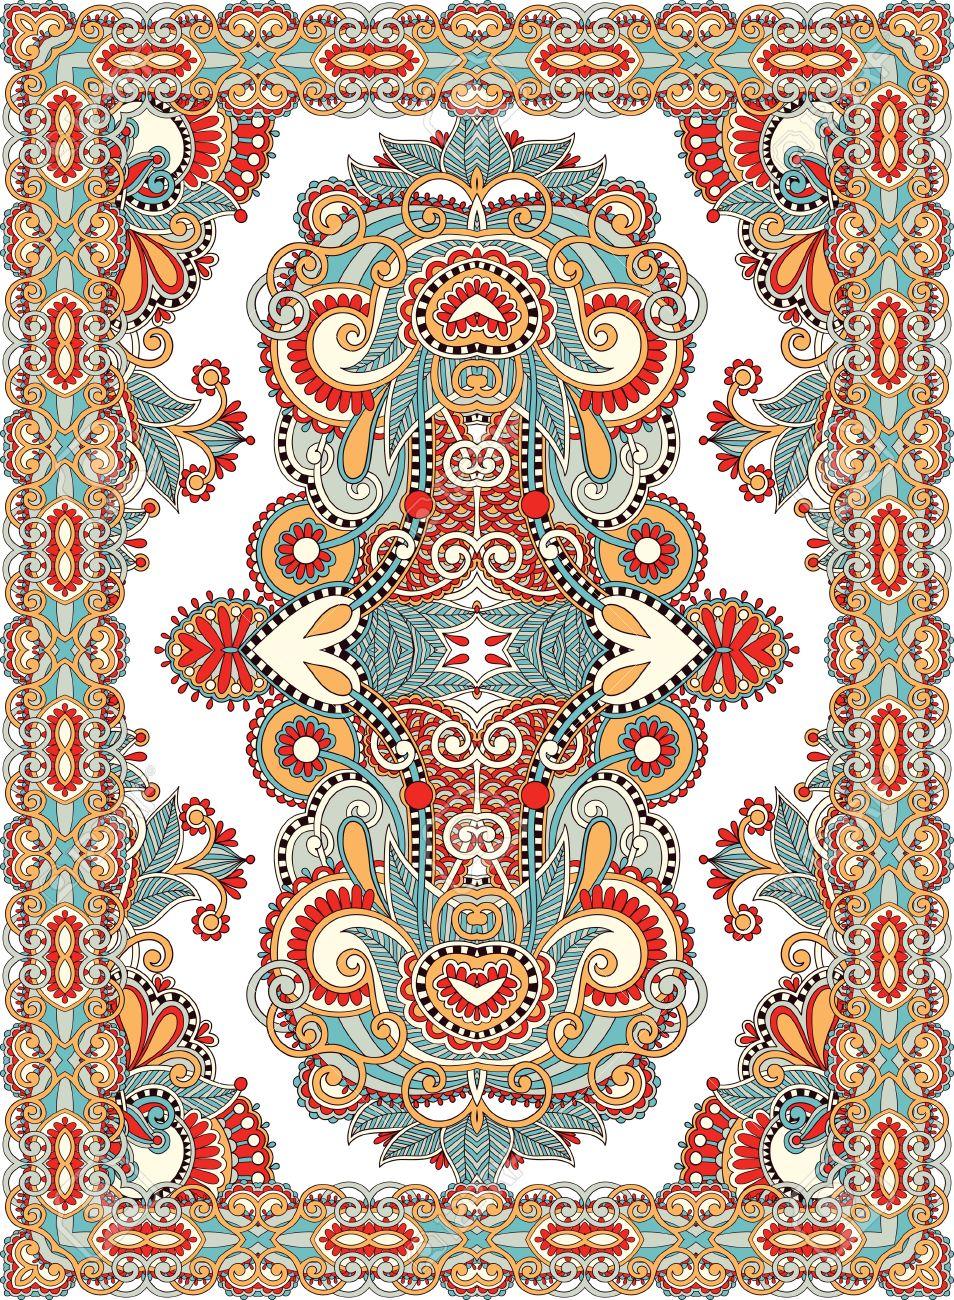 Ukrainian Oriental Floral Ornamental Seamless Carpet Design Stock Vector - 15556191